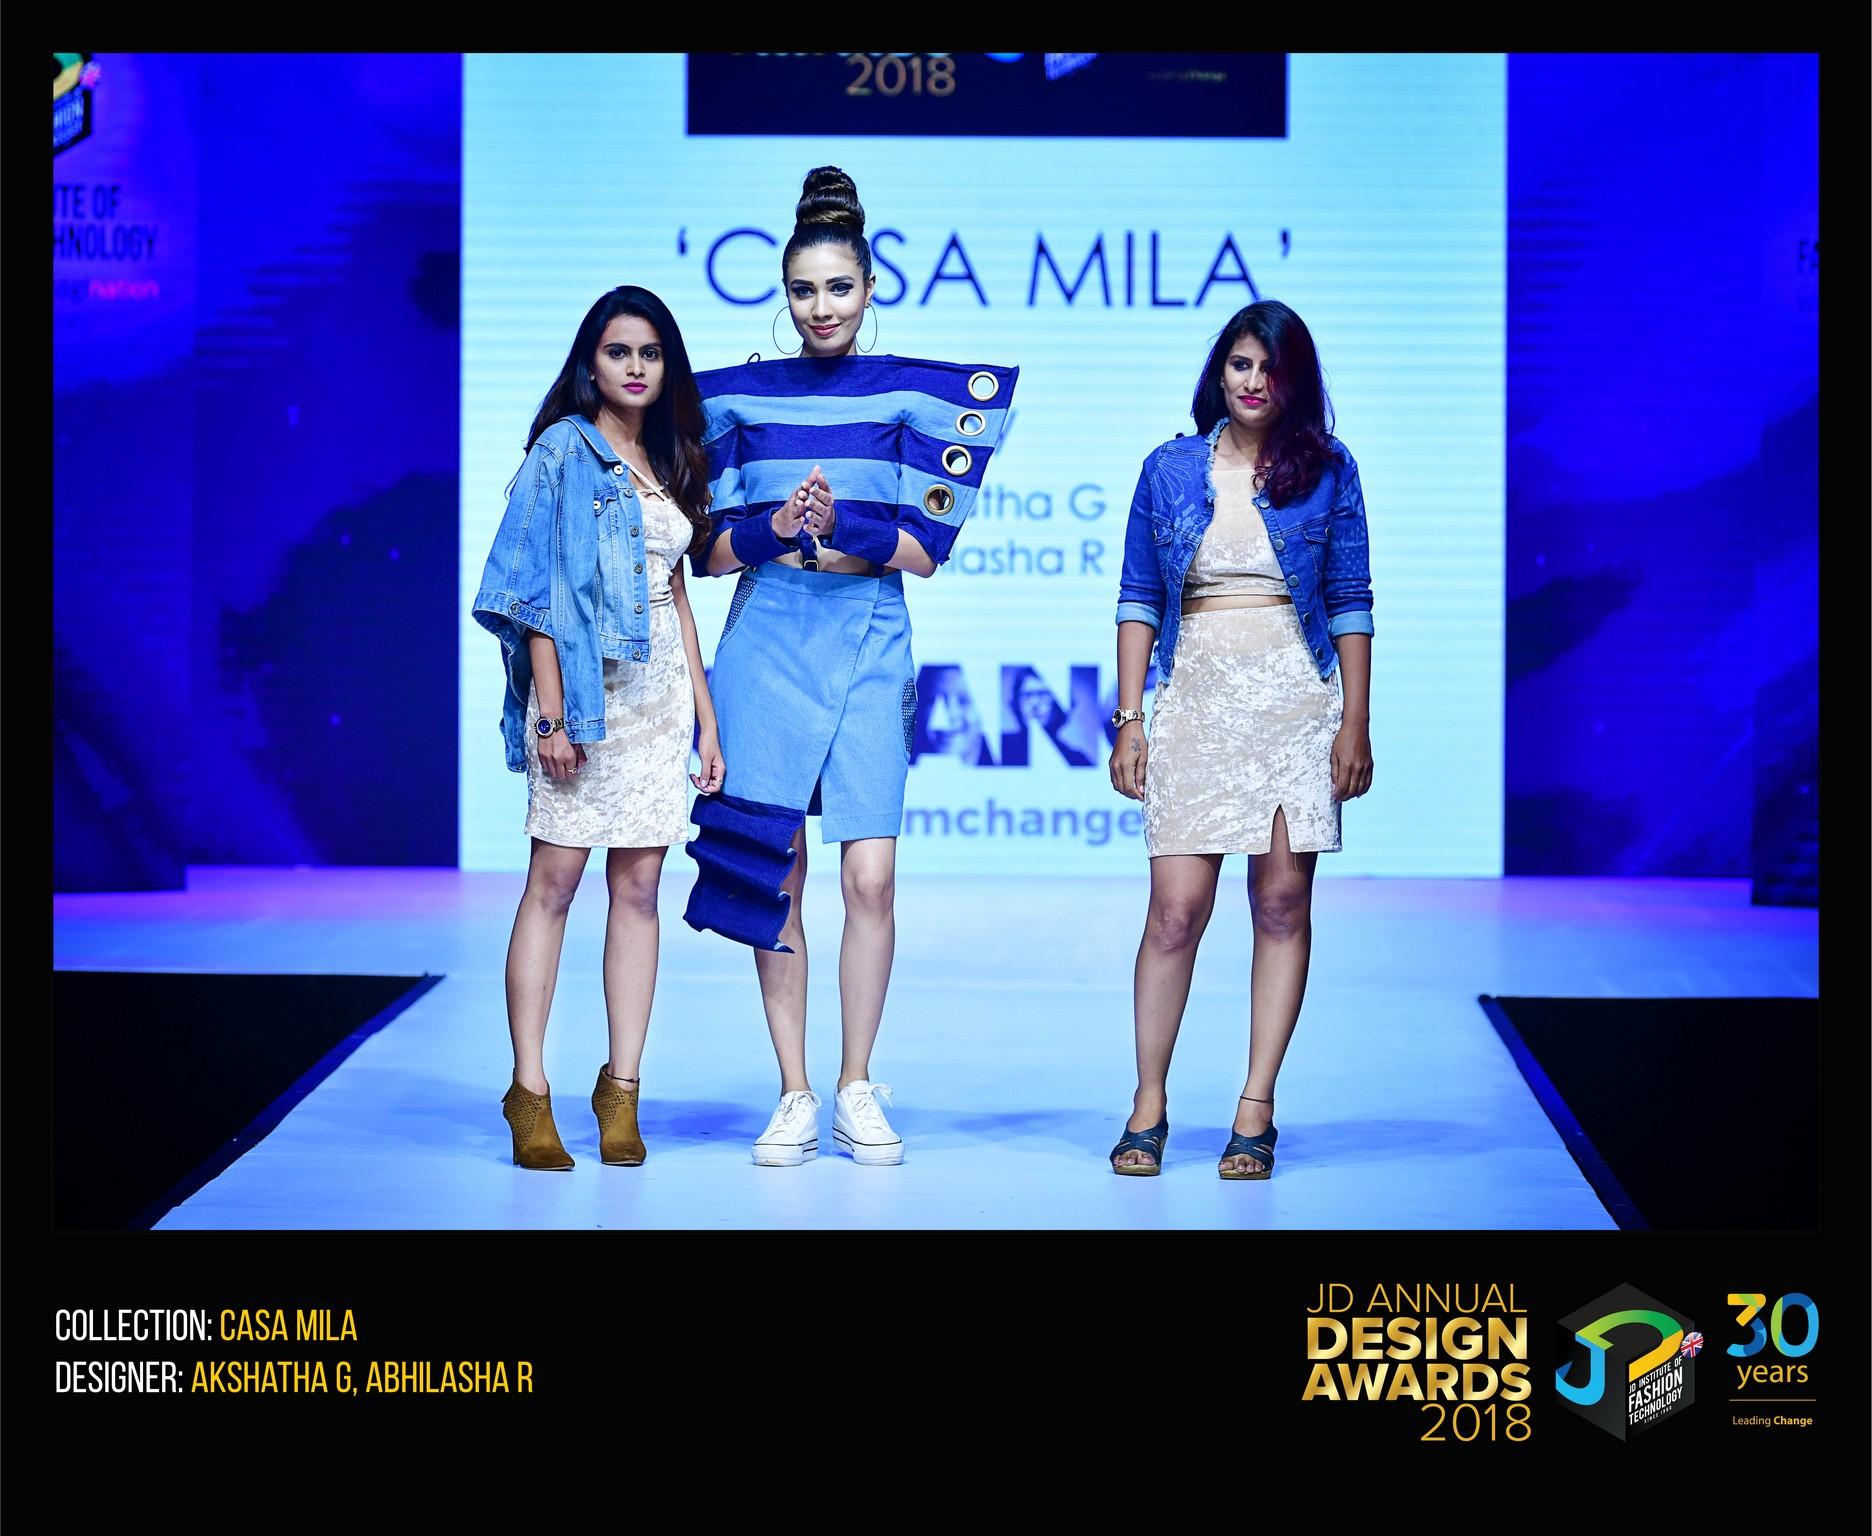 Casa Mila – Change – JD Annual Design Awards 2018   Designer: Akshata, Sapna and Abhilasha   Photography : Jerin Nath (@jerin_nath) casa mila - CASA MILA 8 - Casa Mila – Change – JD Annual Design Awards 2018